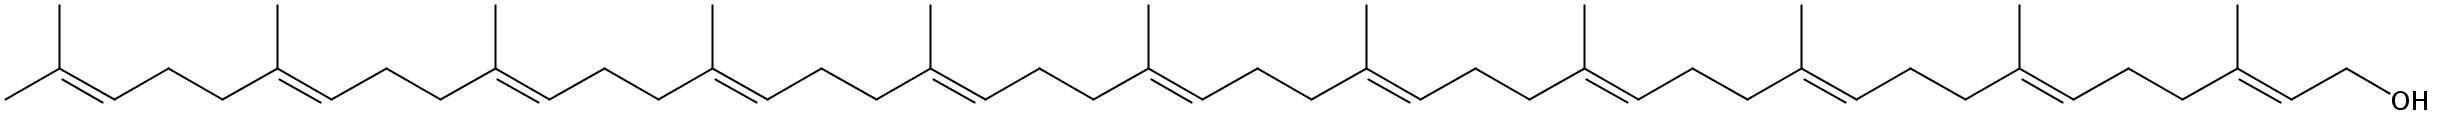 Structural formula of Undecaprenol